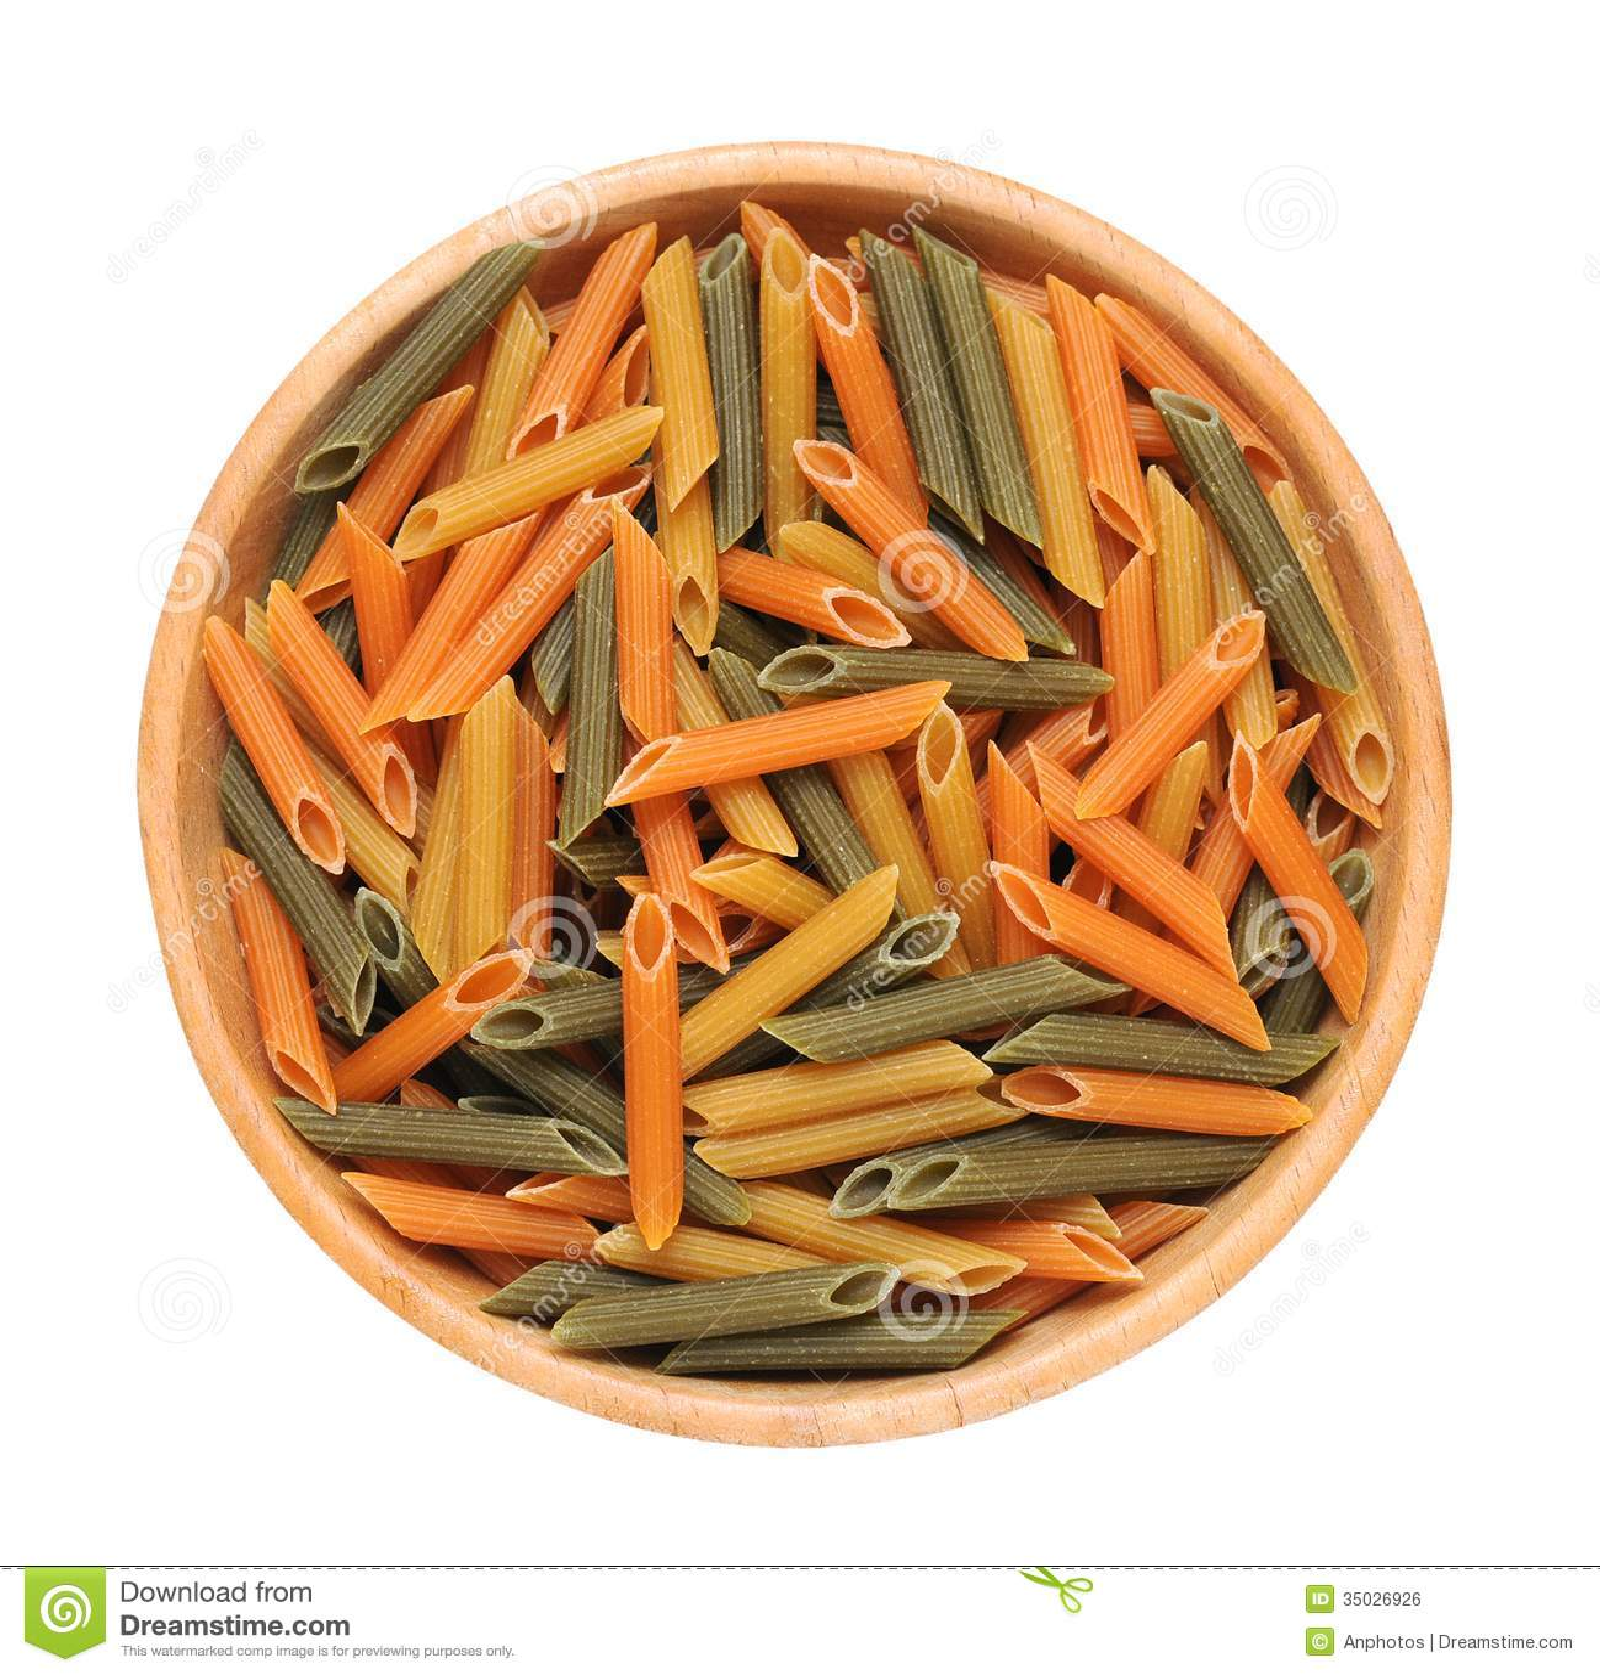 penne rigate pasta royalty free stock image image 35026926. Black Bedroom Furniture Sets. Home Design Ideas